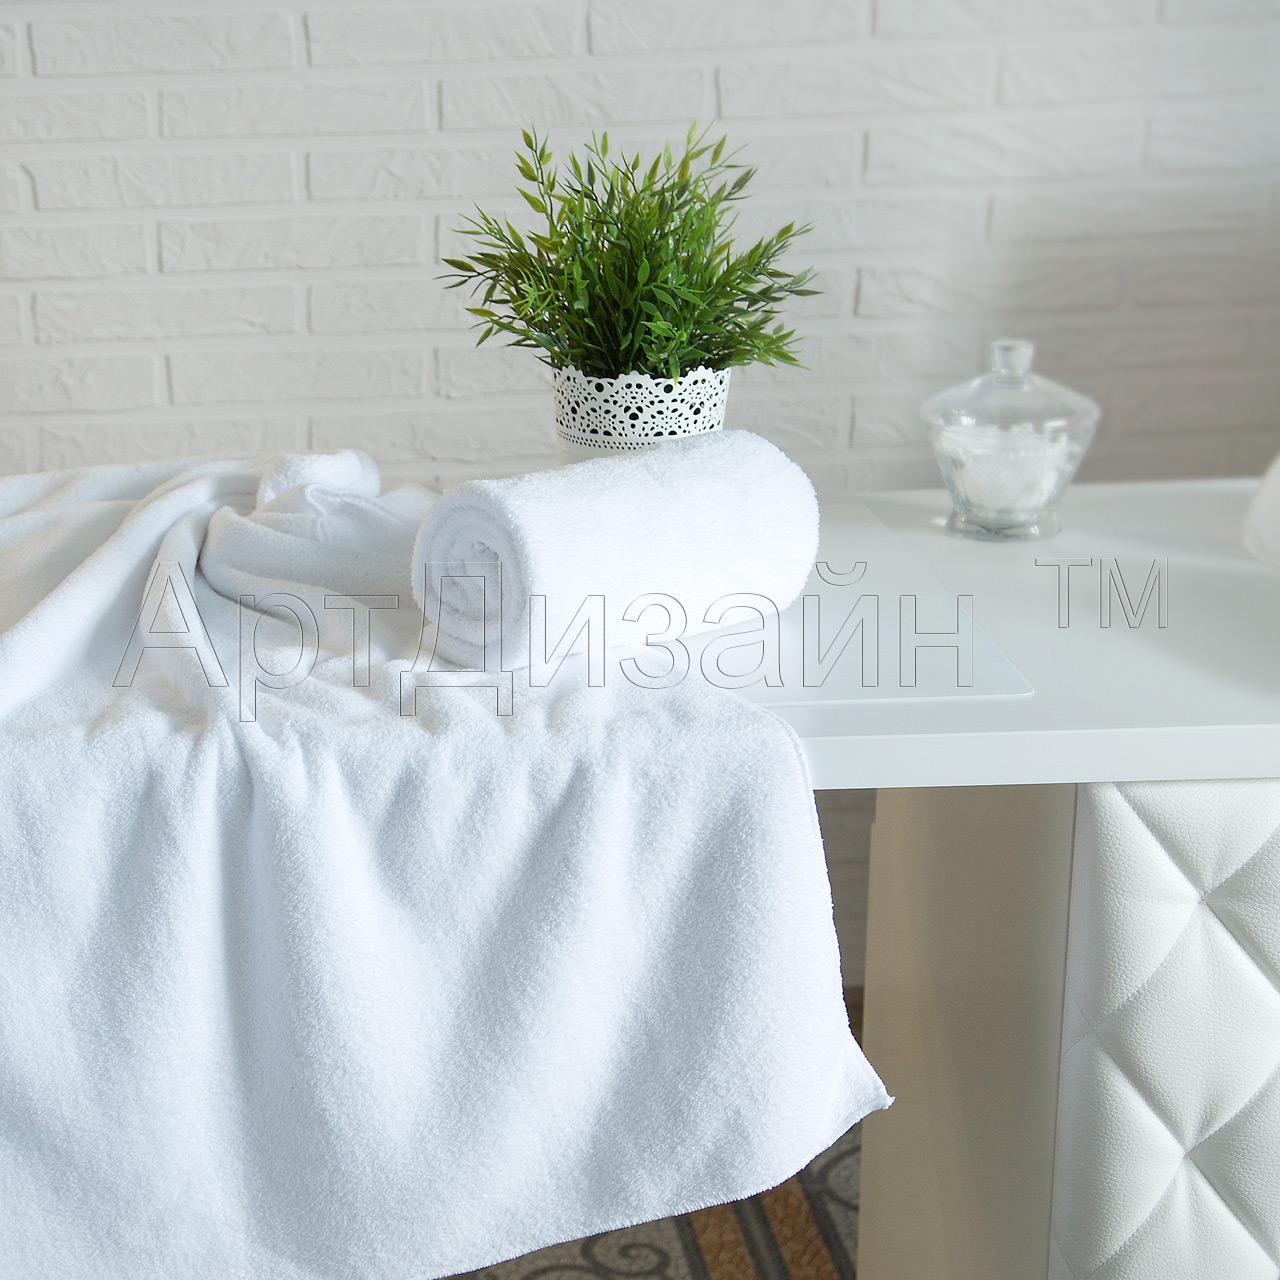 Полотенце Уют Белый р. 65х140Полотенца<br><br><br>Тип: Полотенце<br>Размер: 65х140<br>Материал: Велсофт